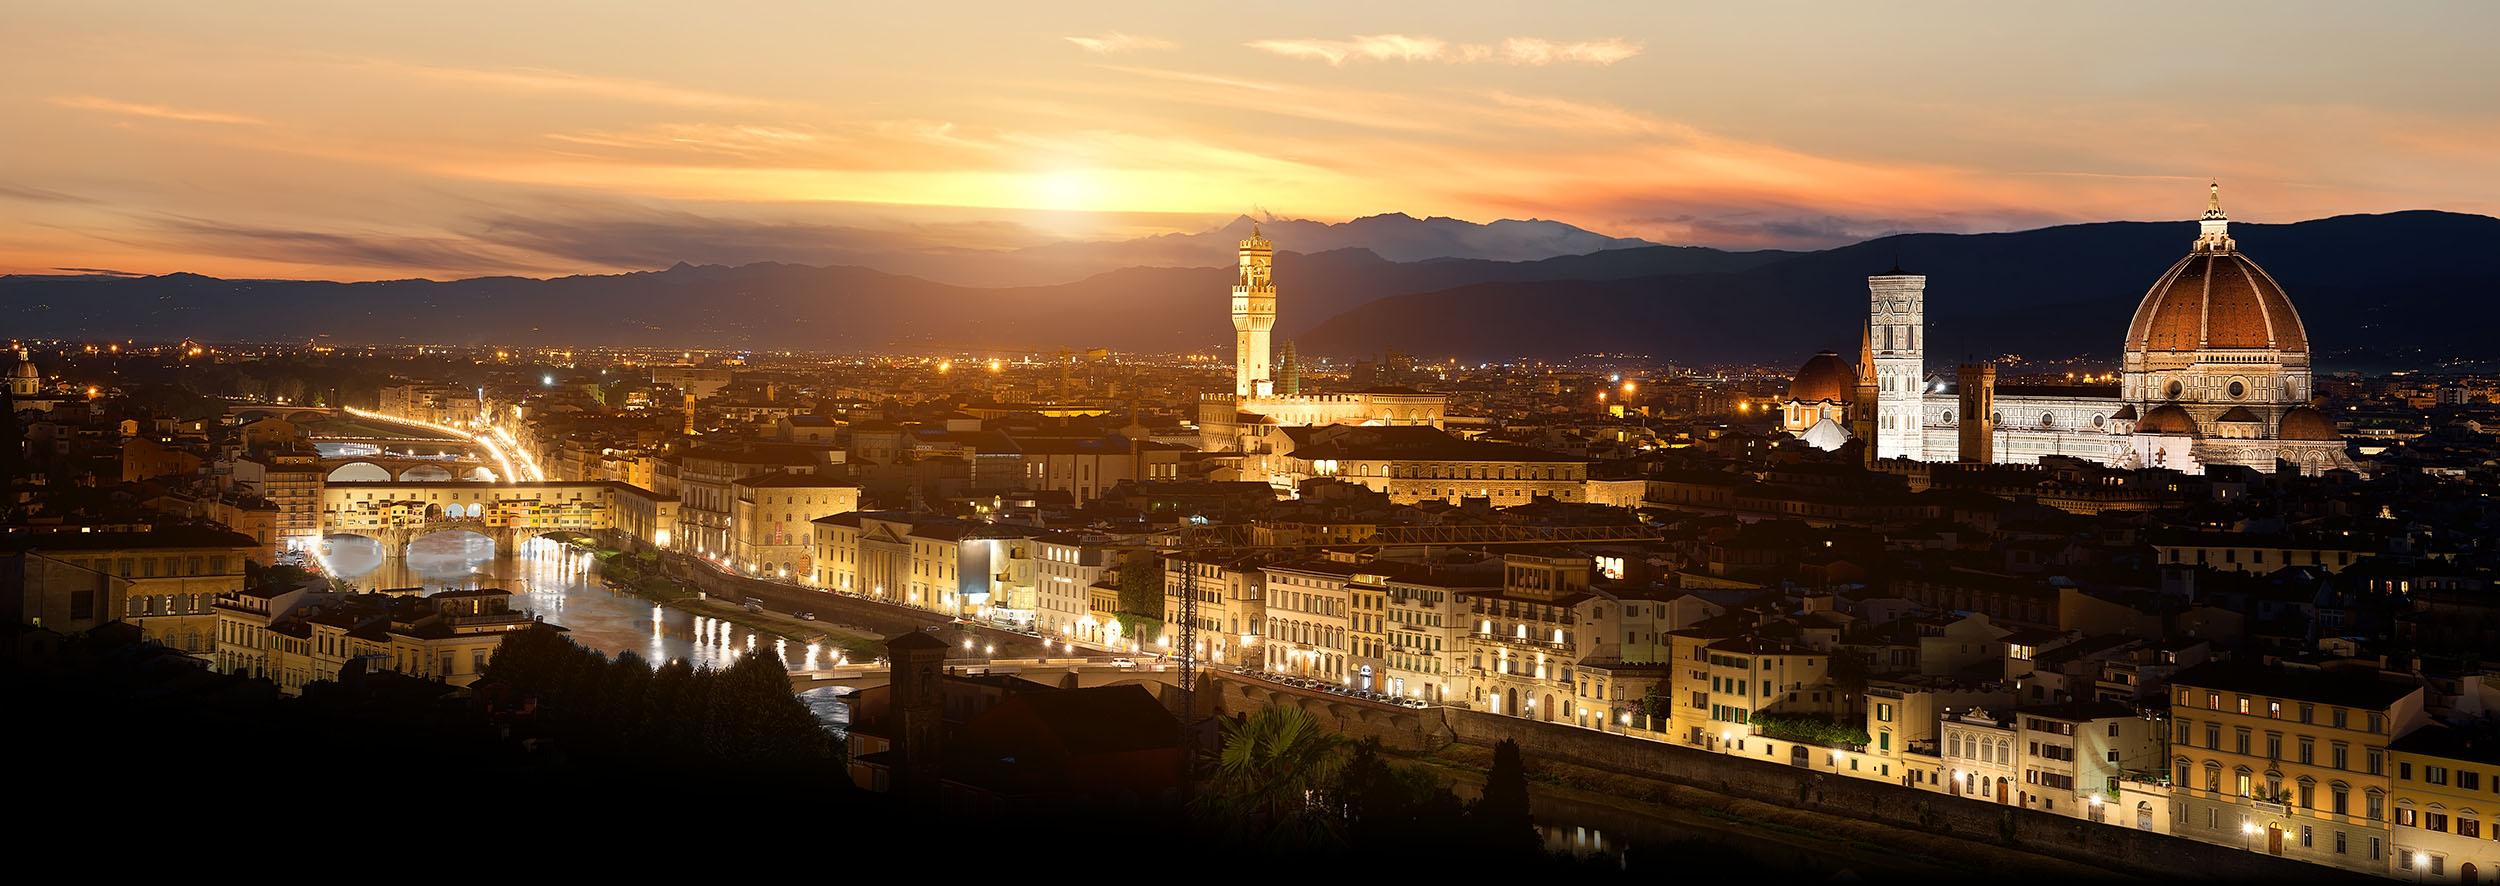 Florence by night beautiful landscape